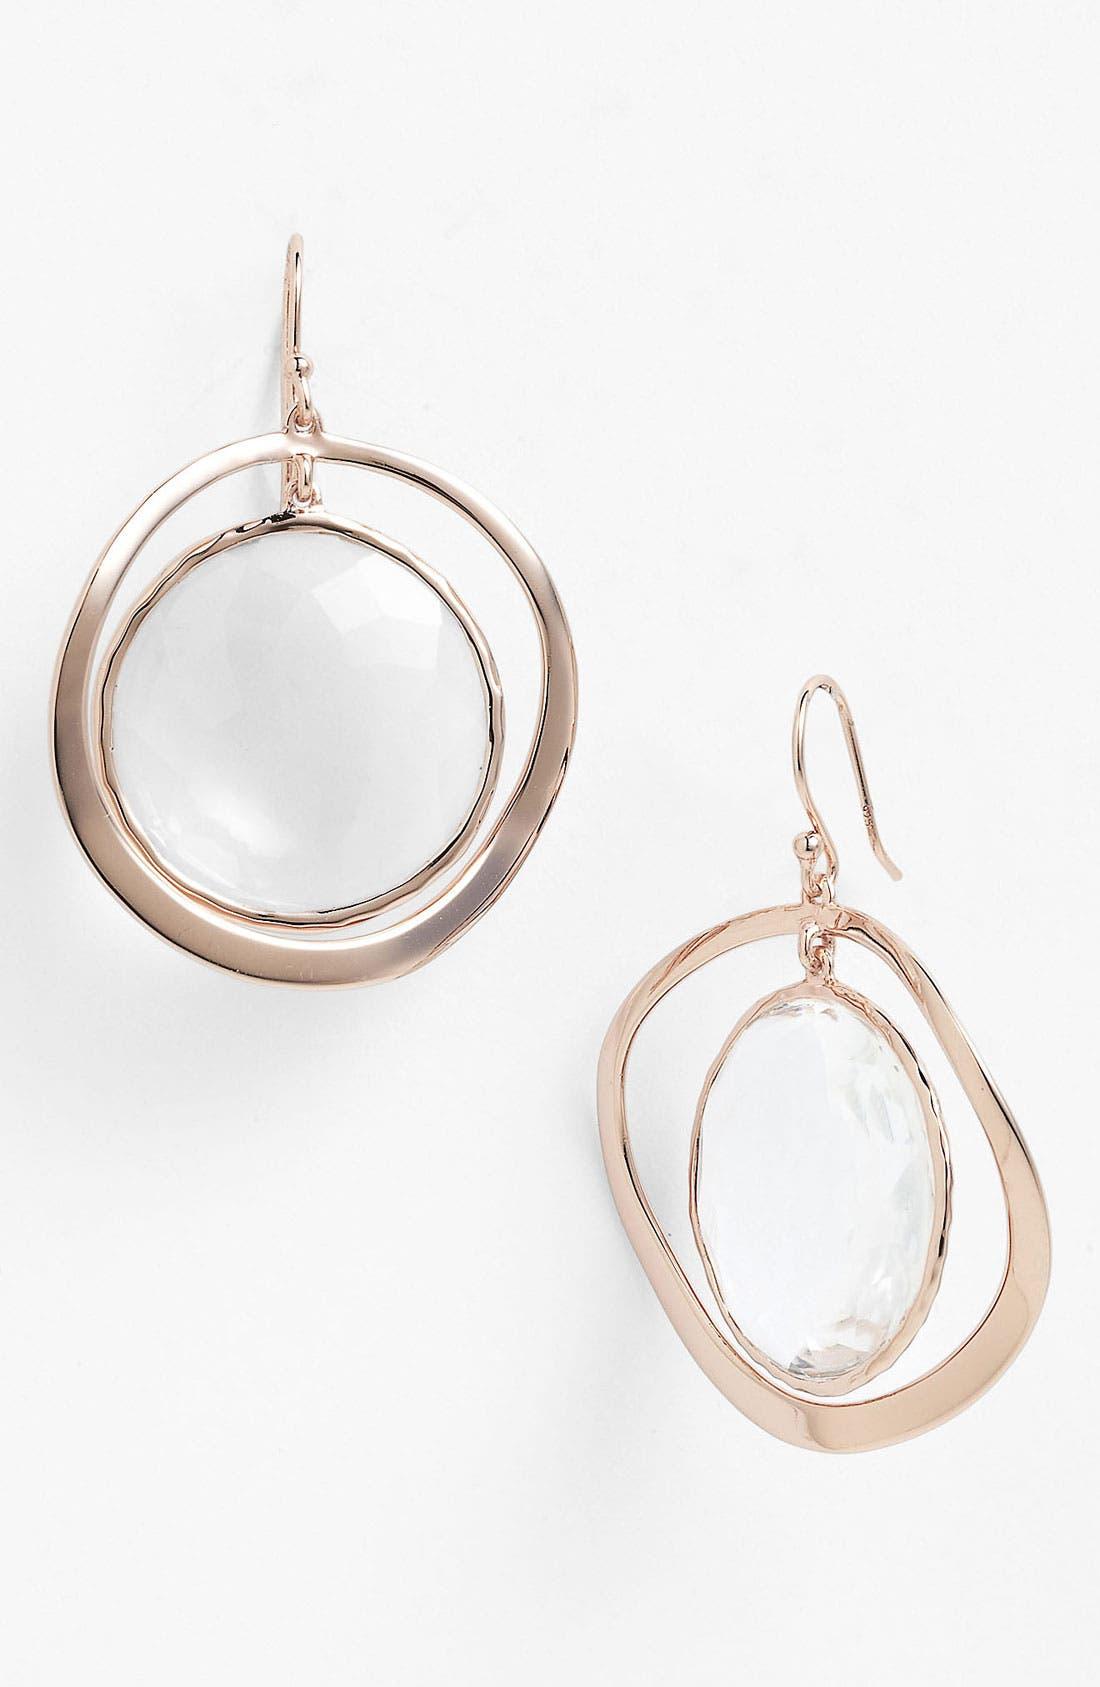 Alternate Image 1 Selected - Ippolita 'Lite Links' Round Stone Drop Earrings